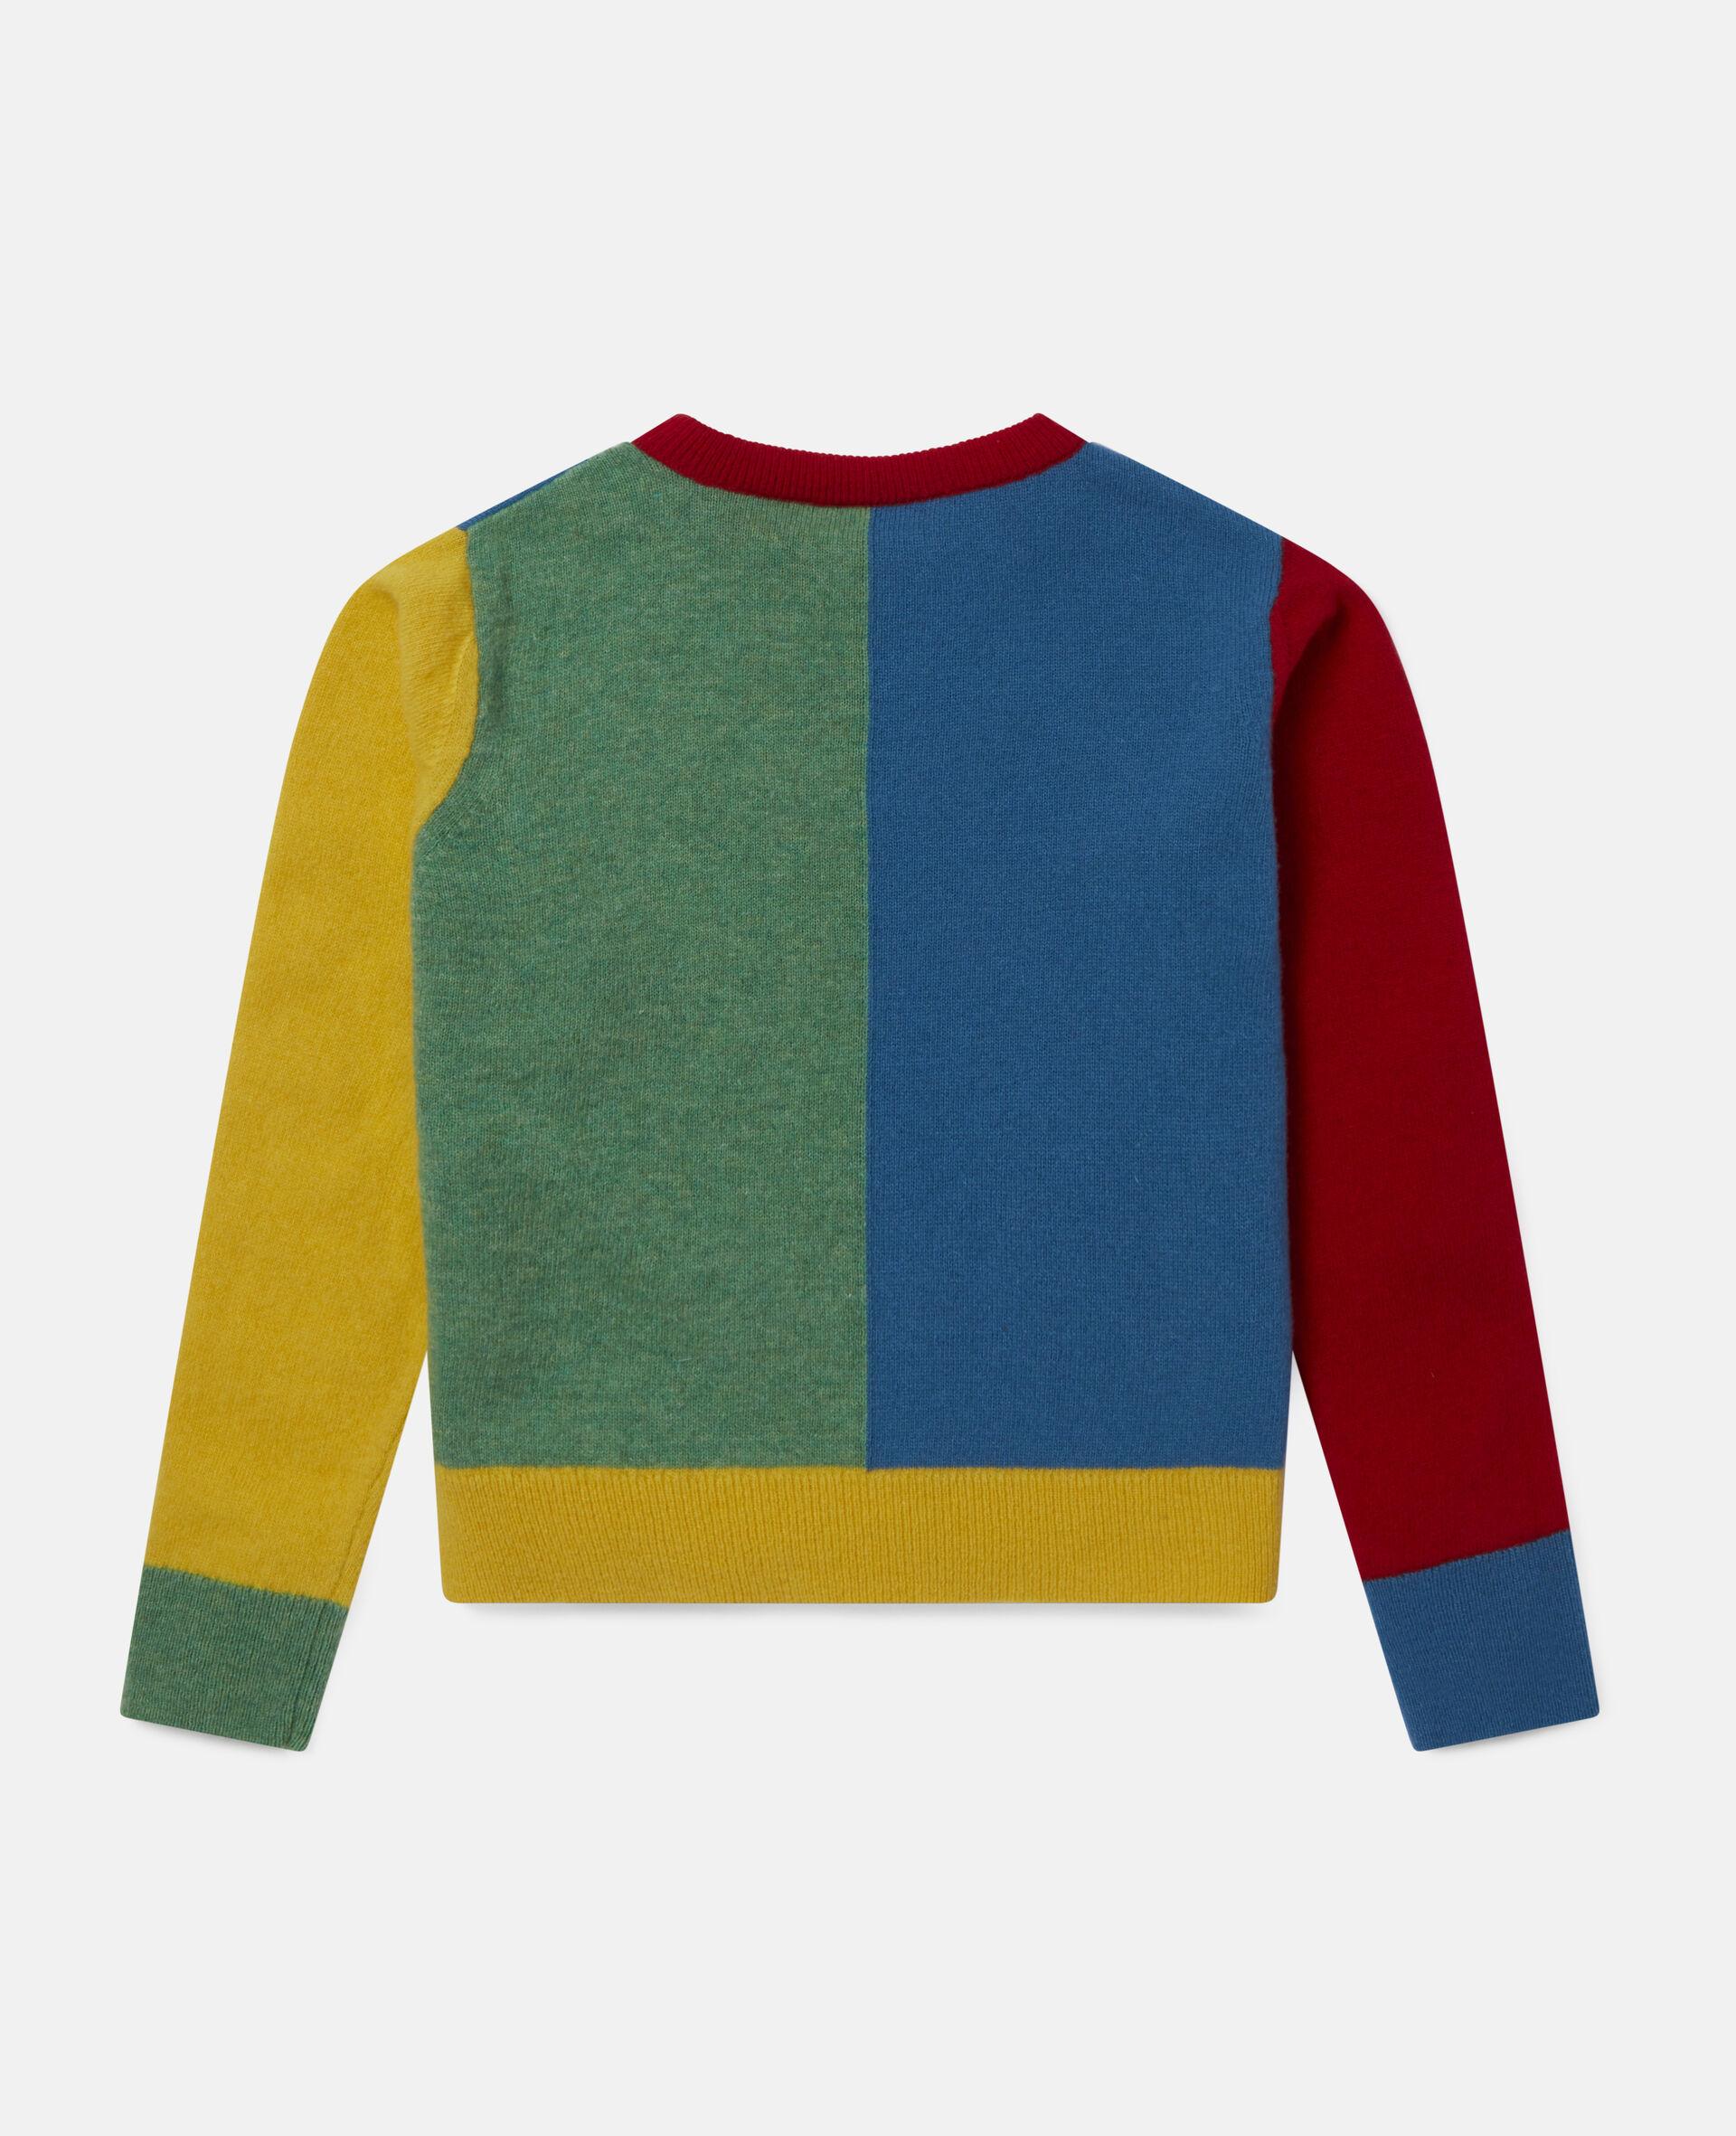 Strickpullover in Blockfarben-Design mit Intarsienmuster -Bunt-large image number 3